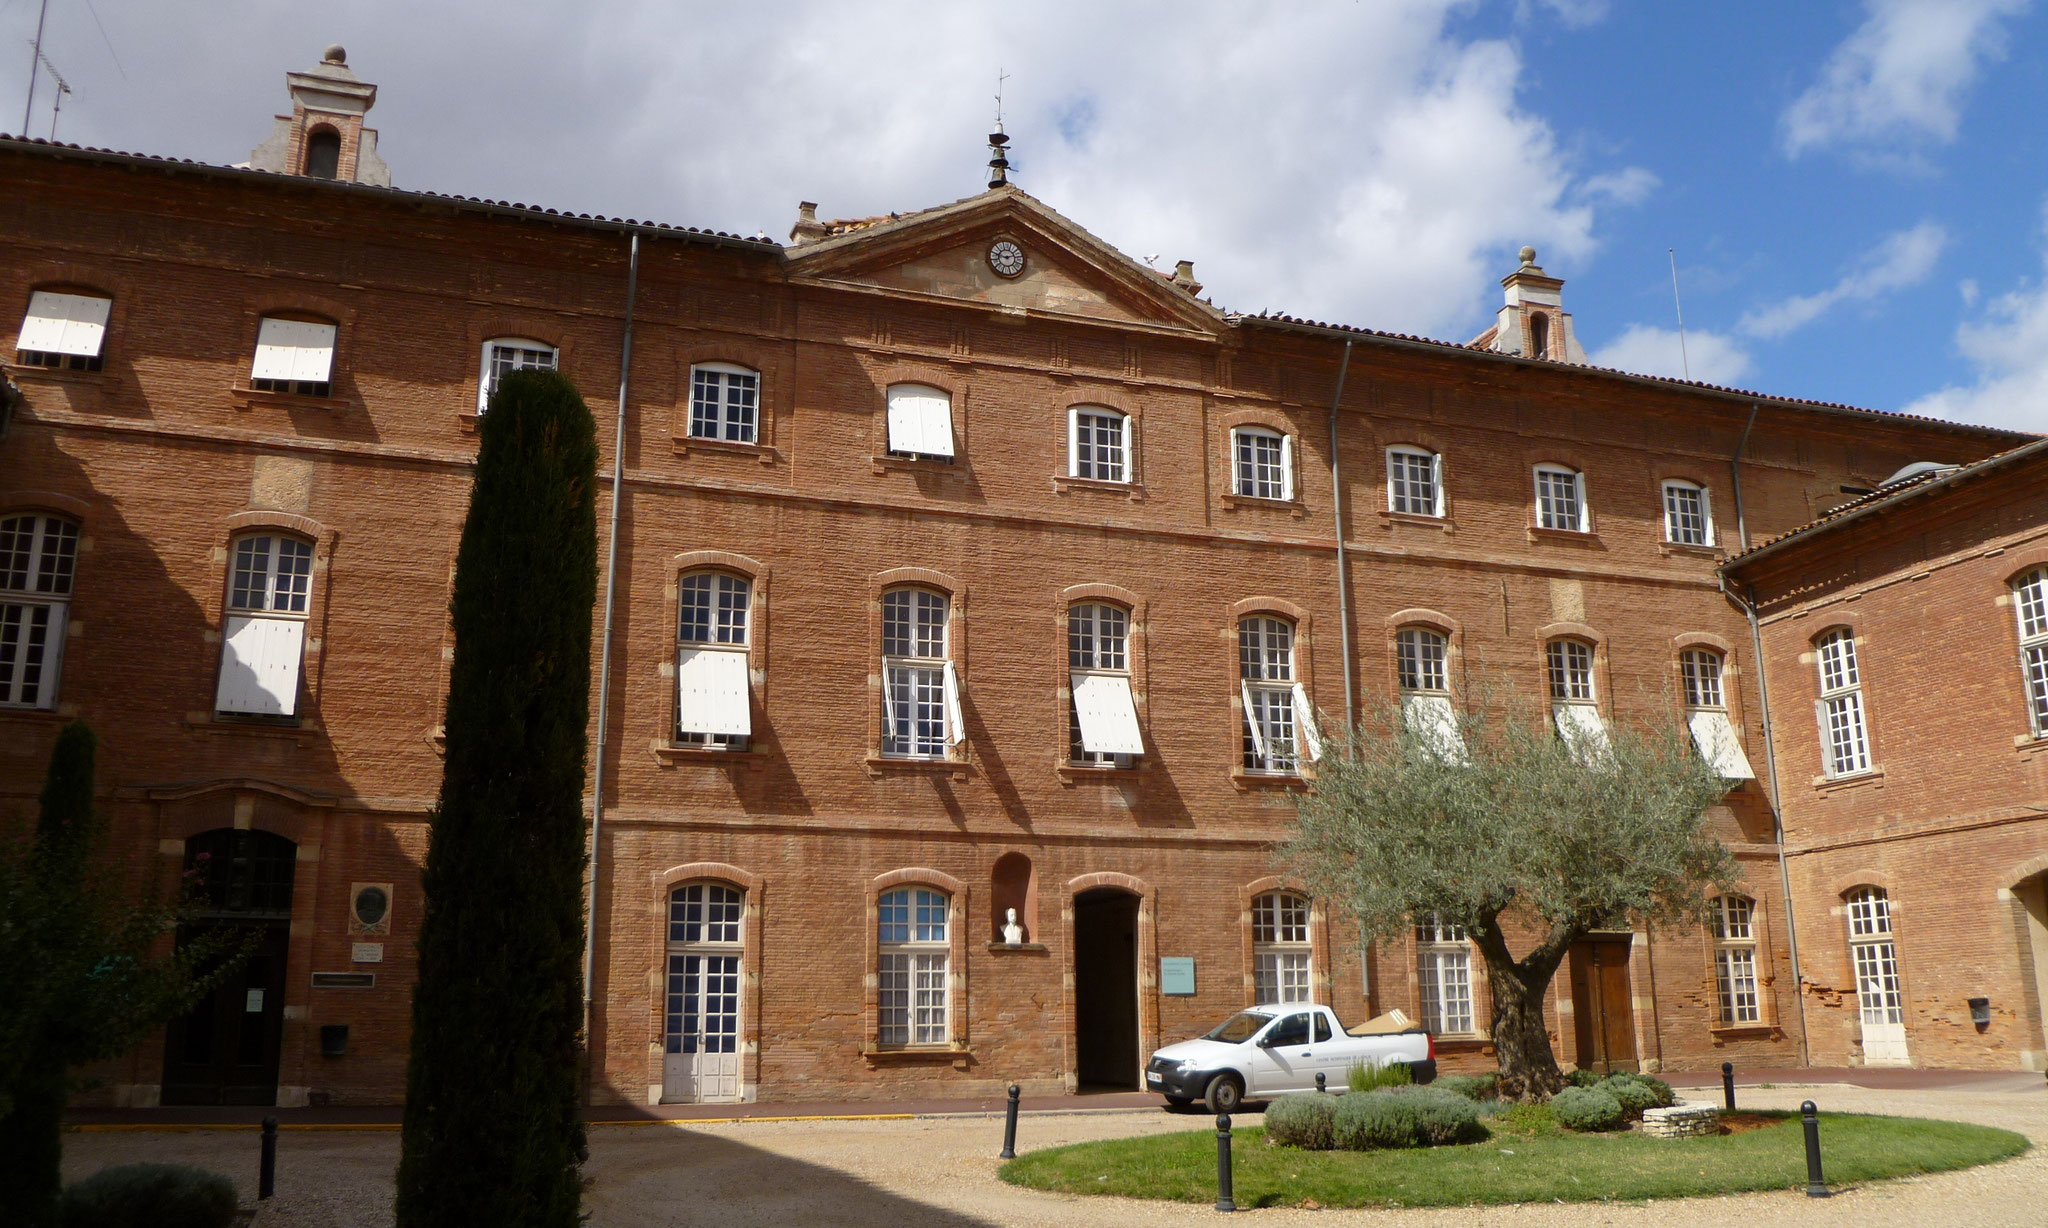 L'hôpital, construit au XVIIIe siècle